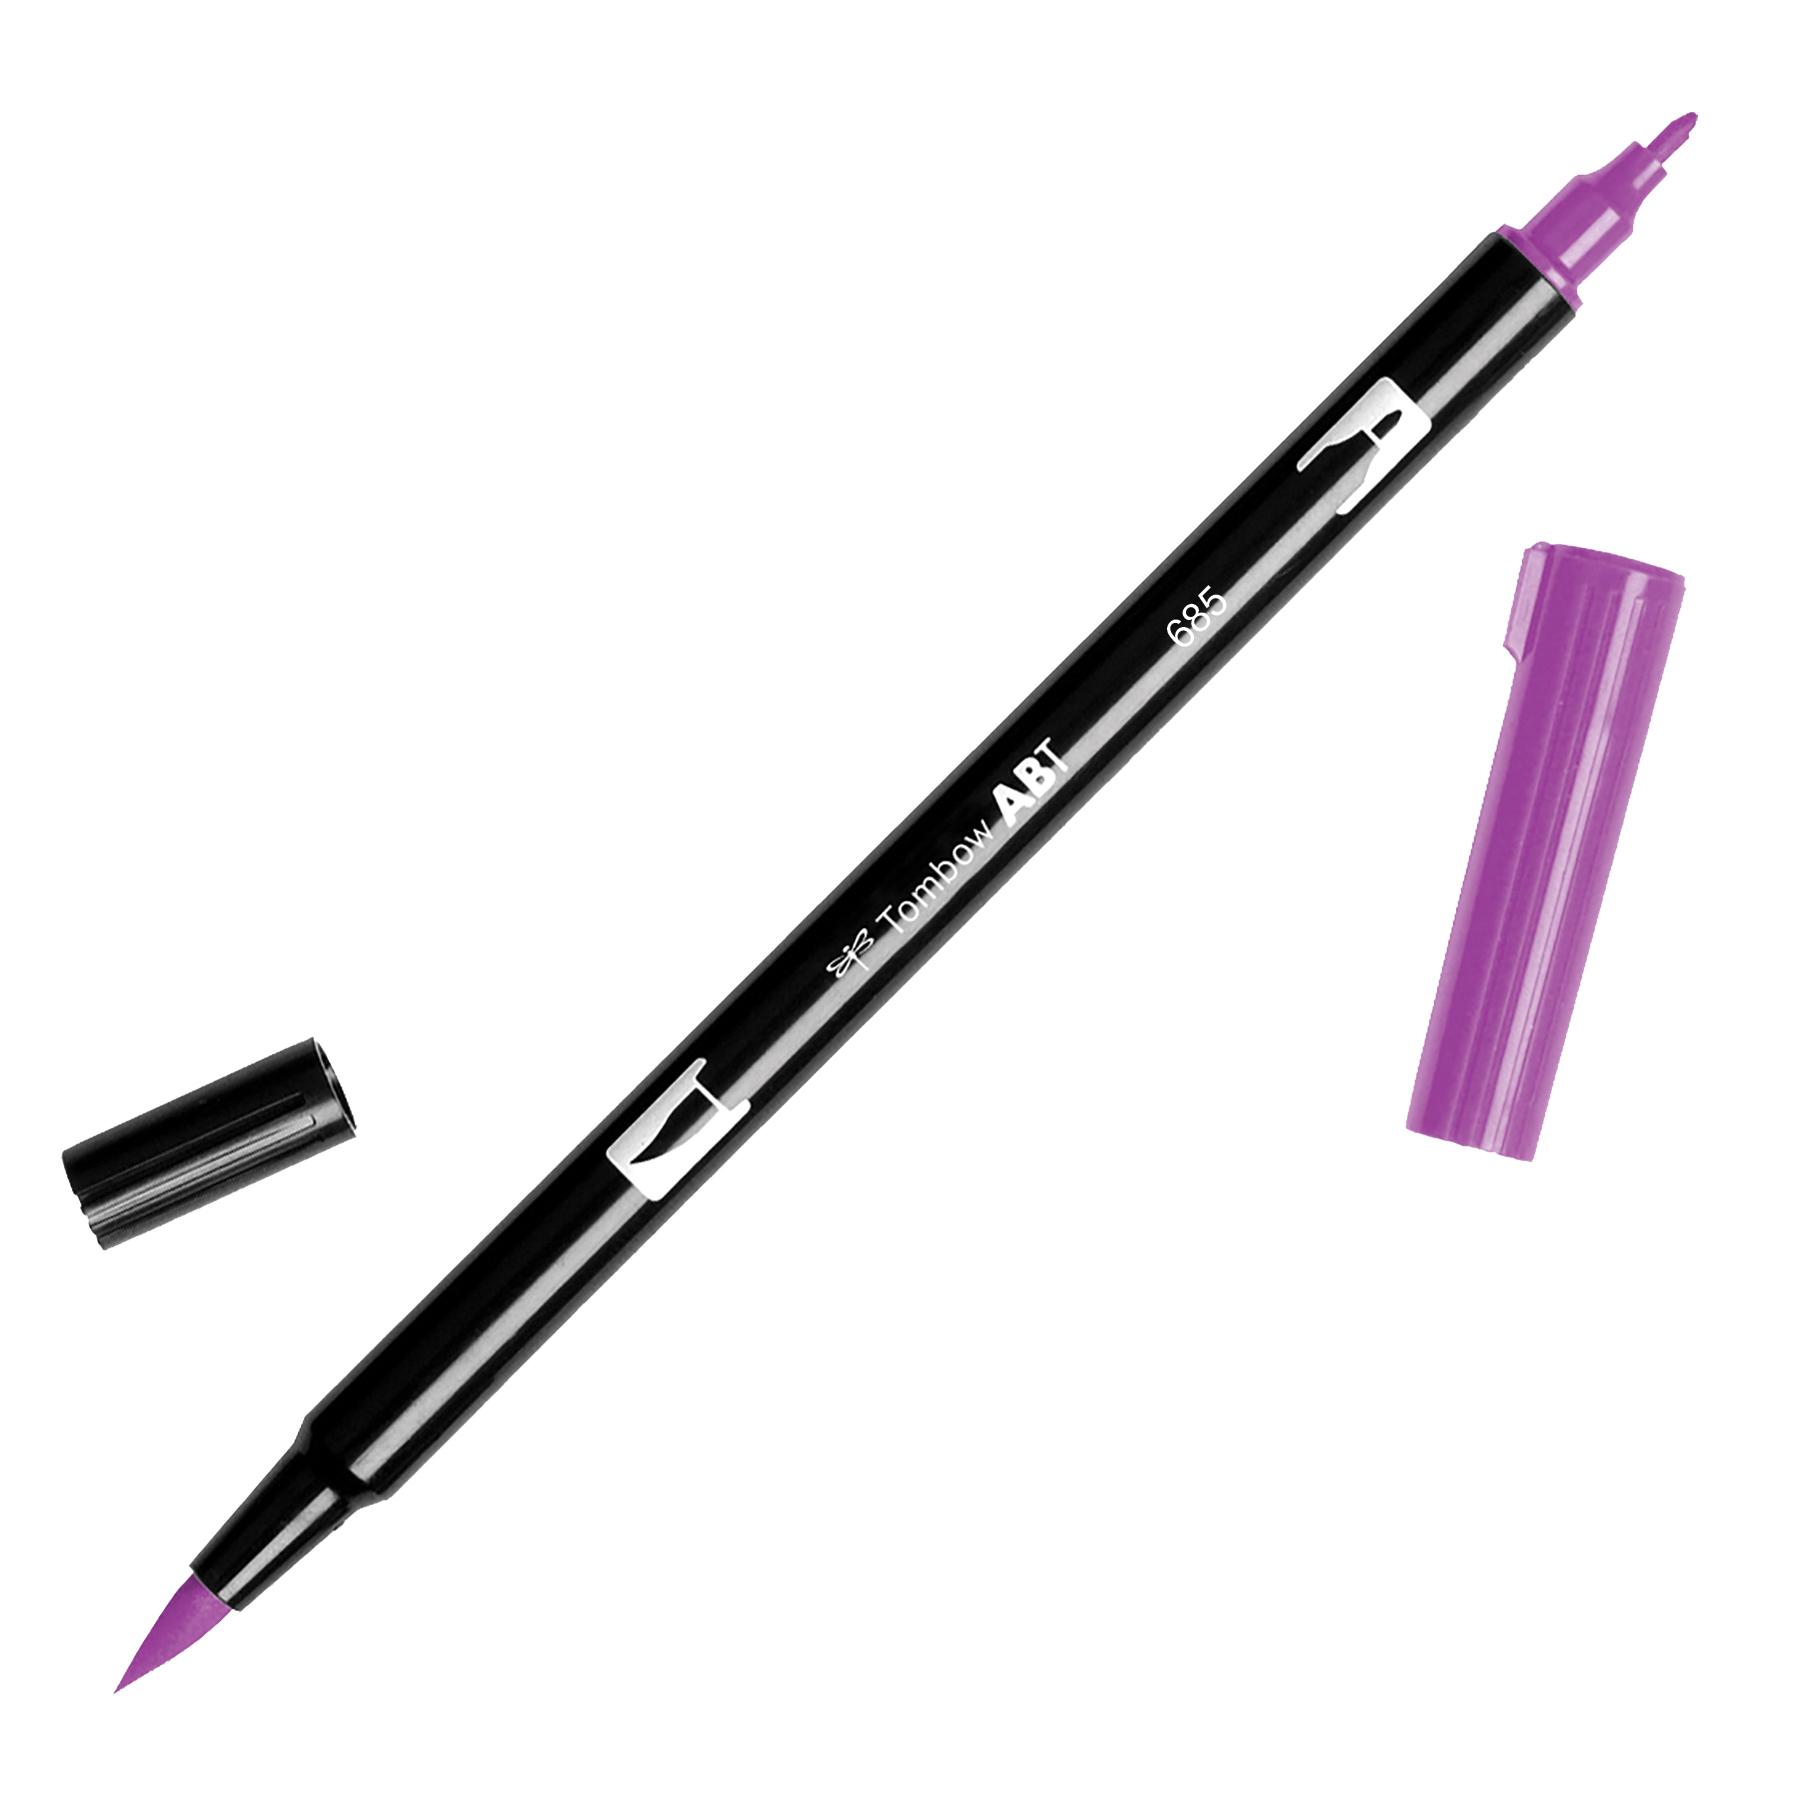 Tombow Dual Brush Marker Open Stock-685 Deep Magenta